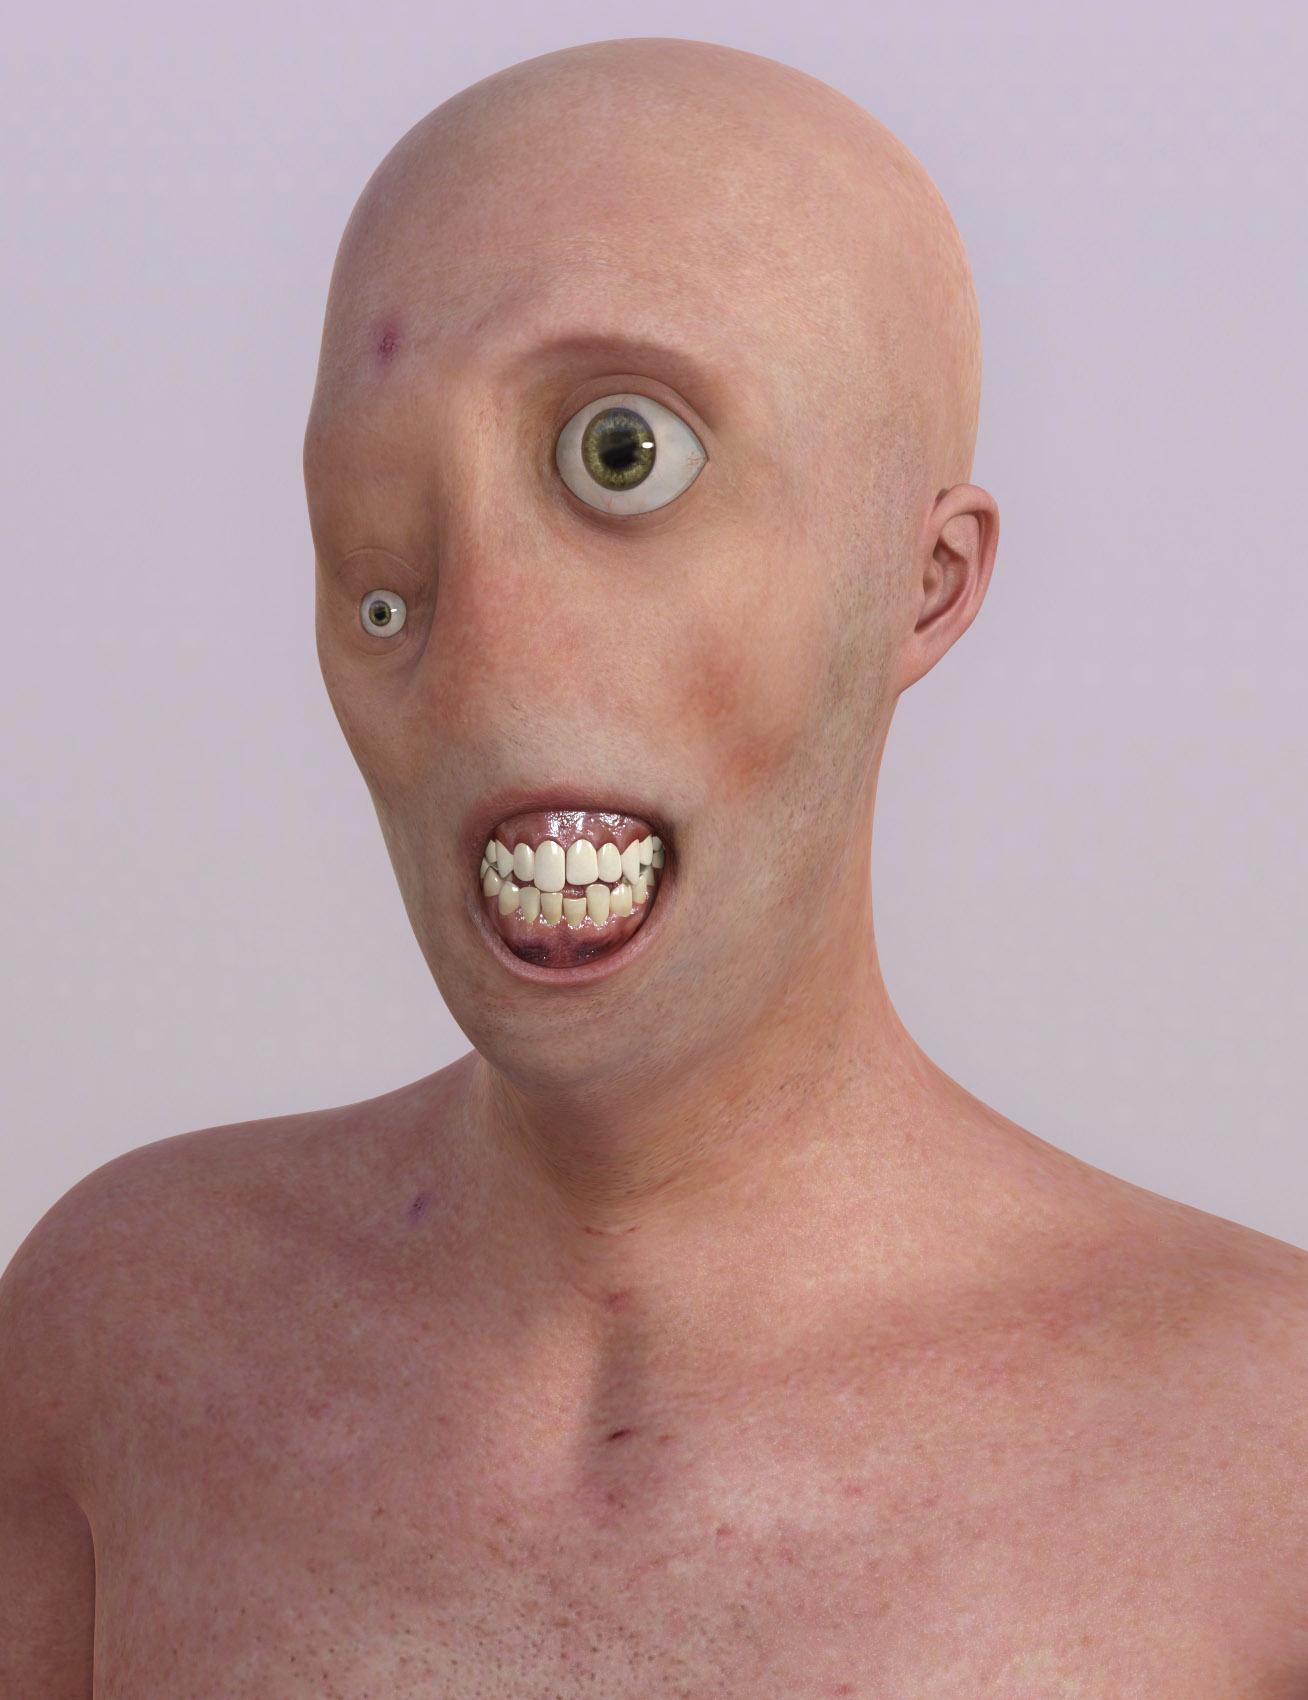 Hypnagog for Genesis 8 Male by: Oskarsson, 3D Models by Daz 3D